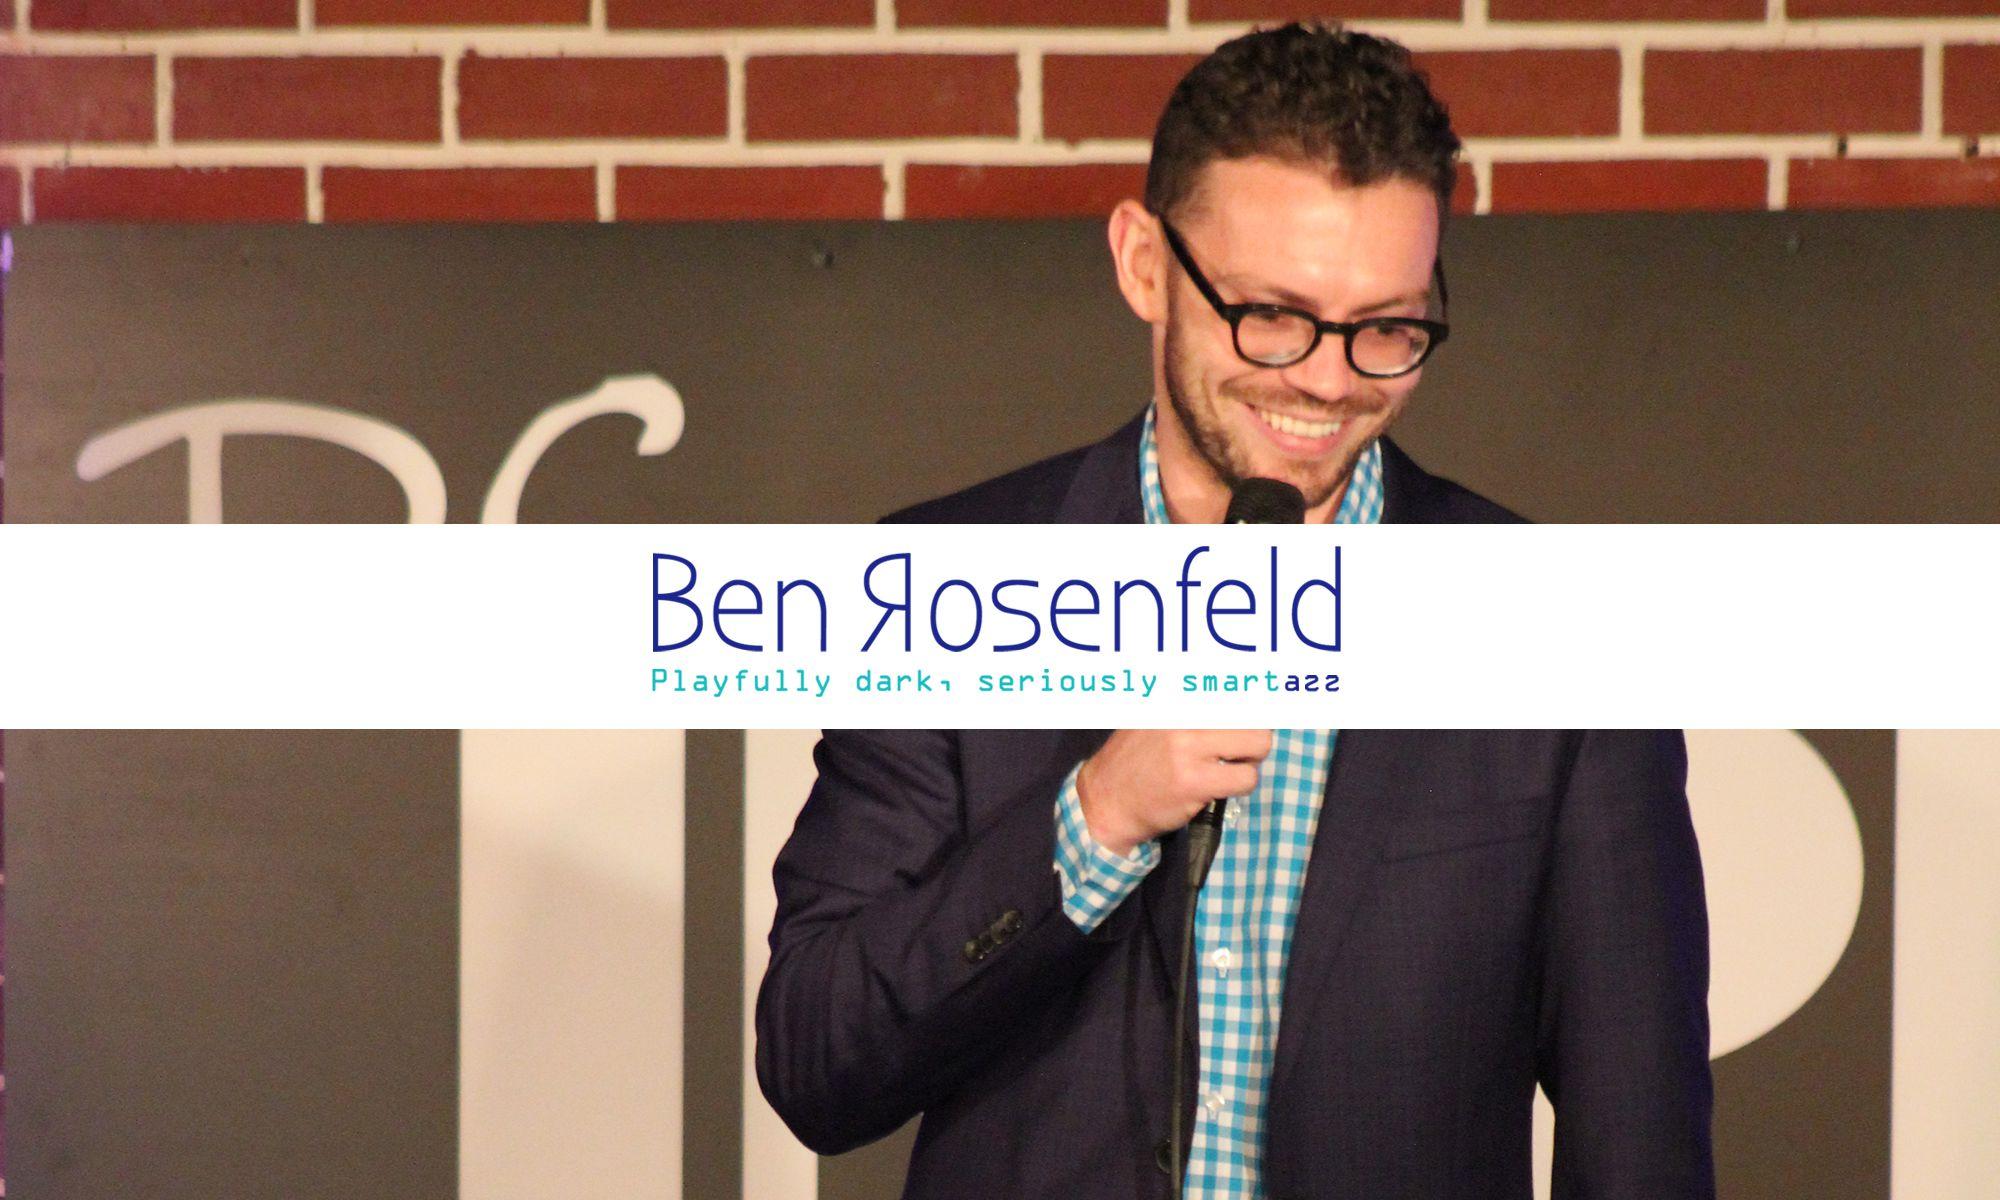 Ben Rosenfeld - Comedian